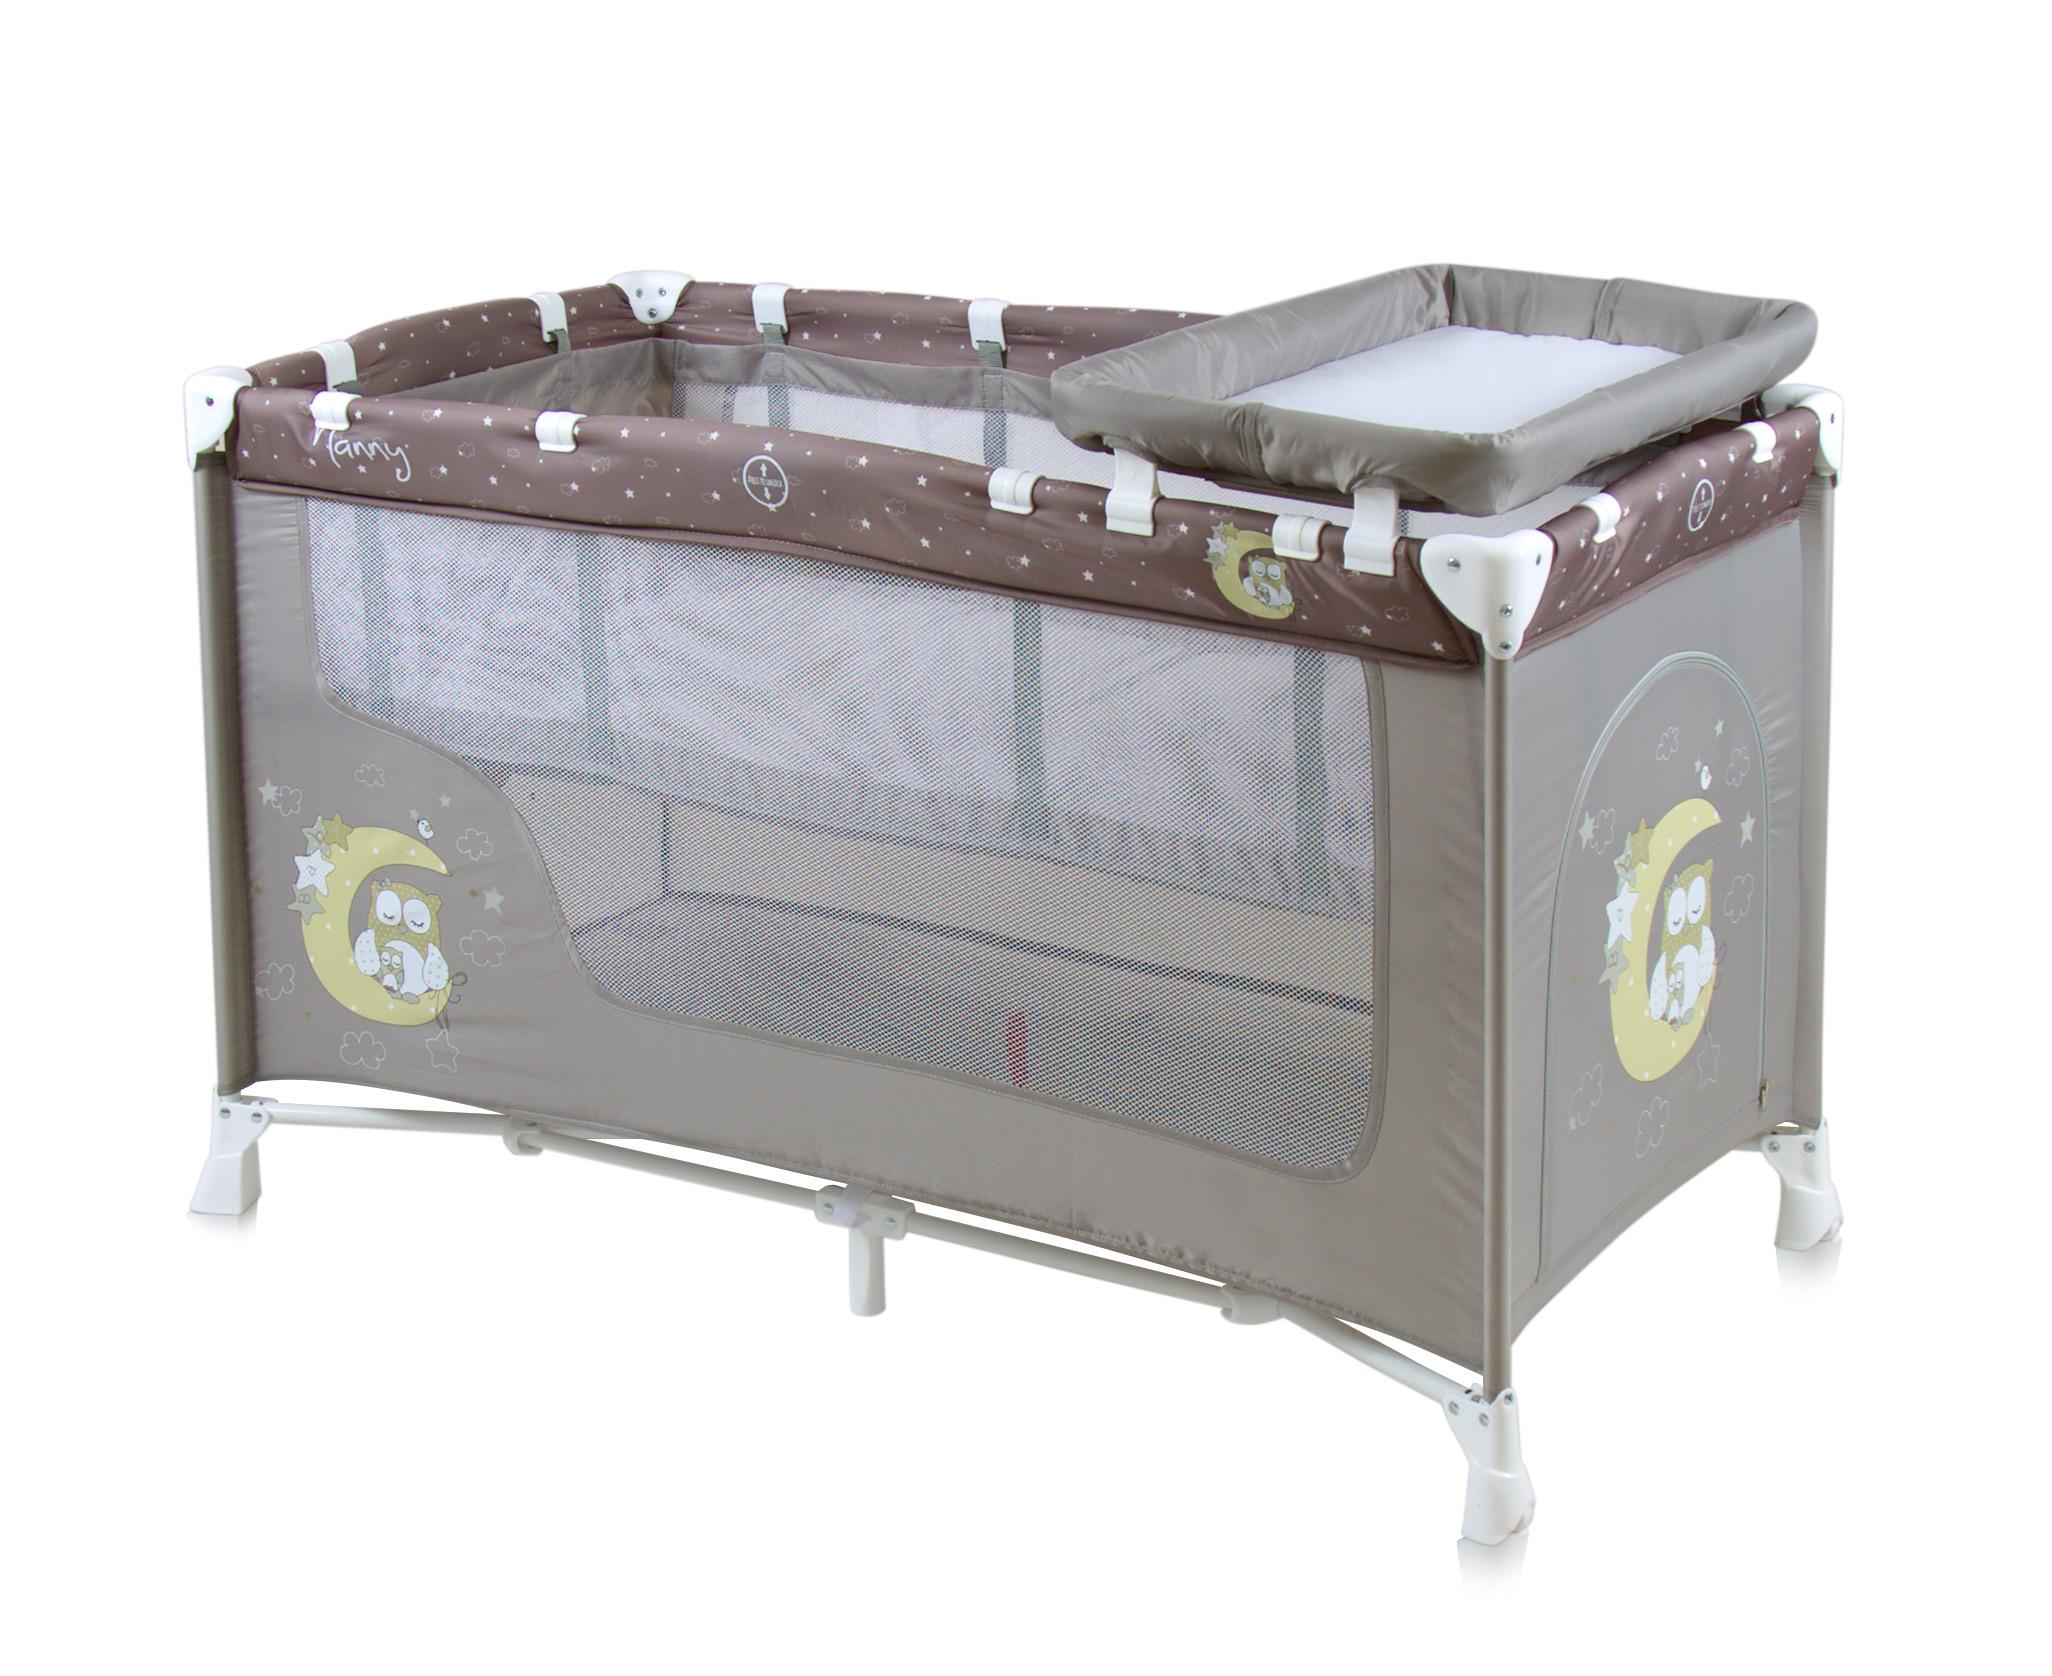 lit parapluie b b nanny 2 lorelli. Black Bedroom Furniture Sets. Home Design Ideas